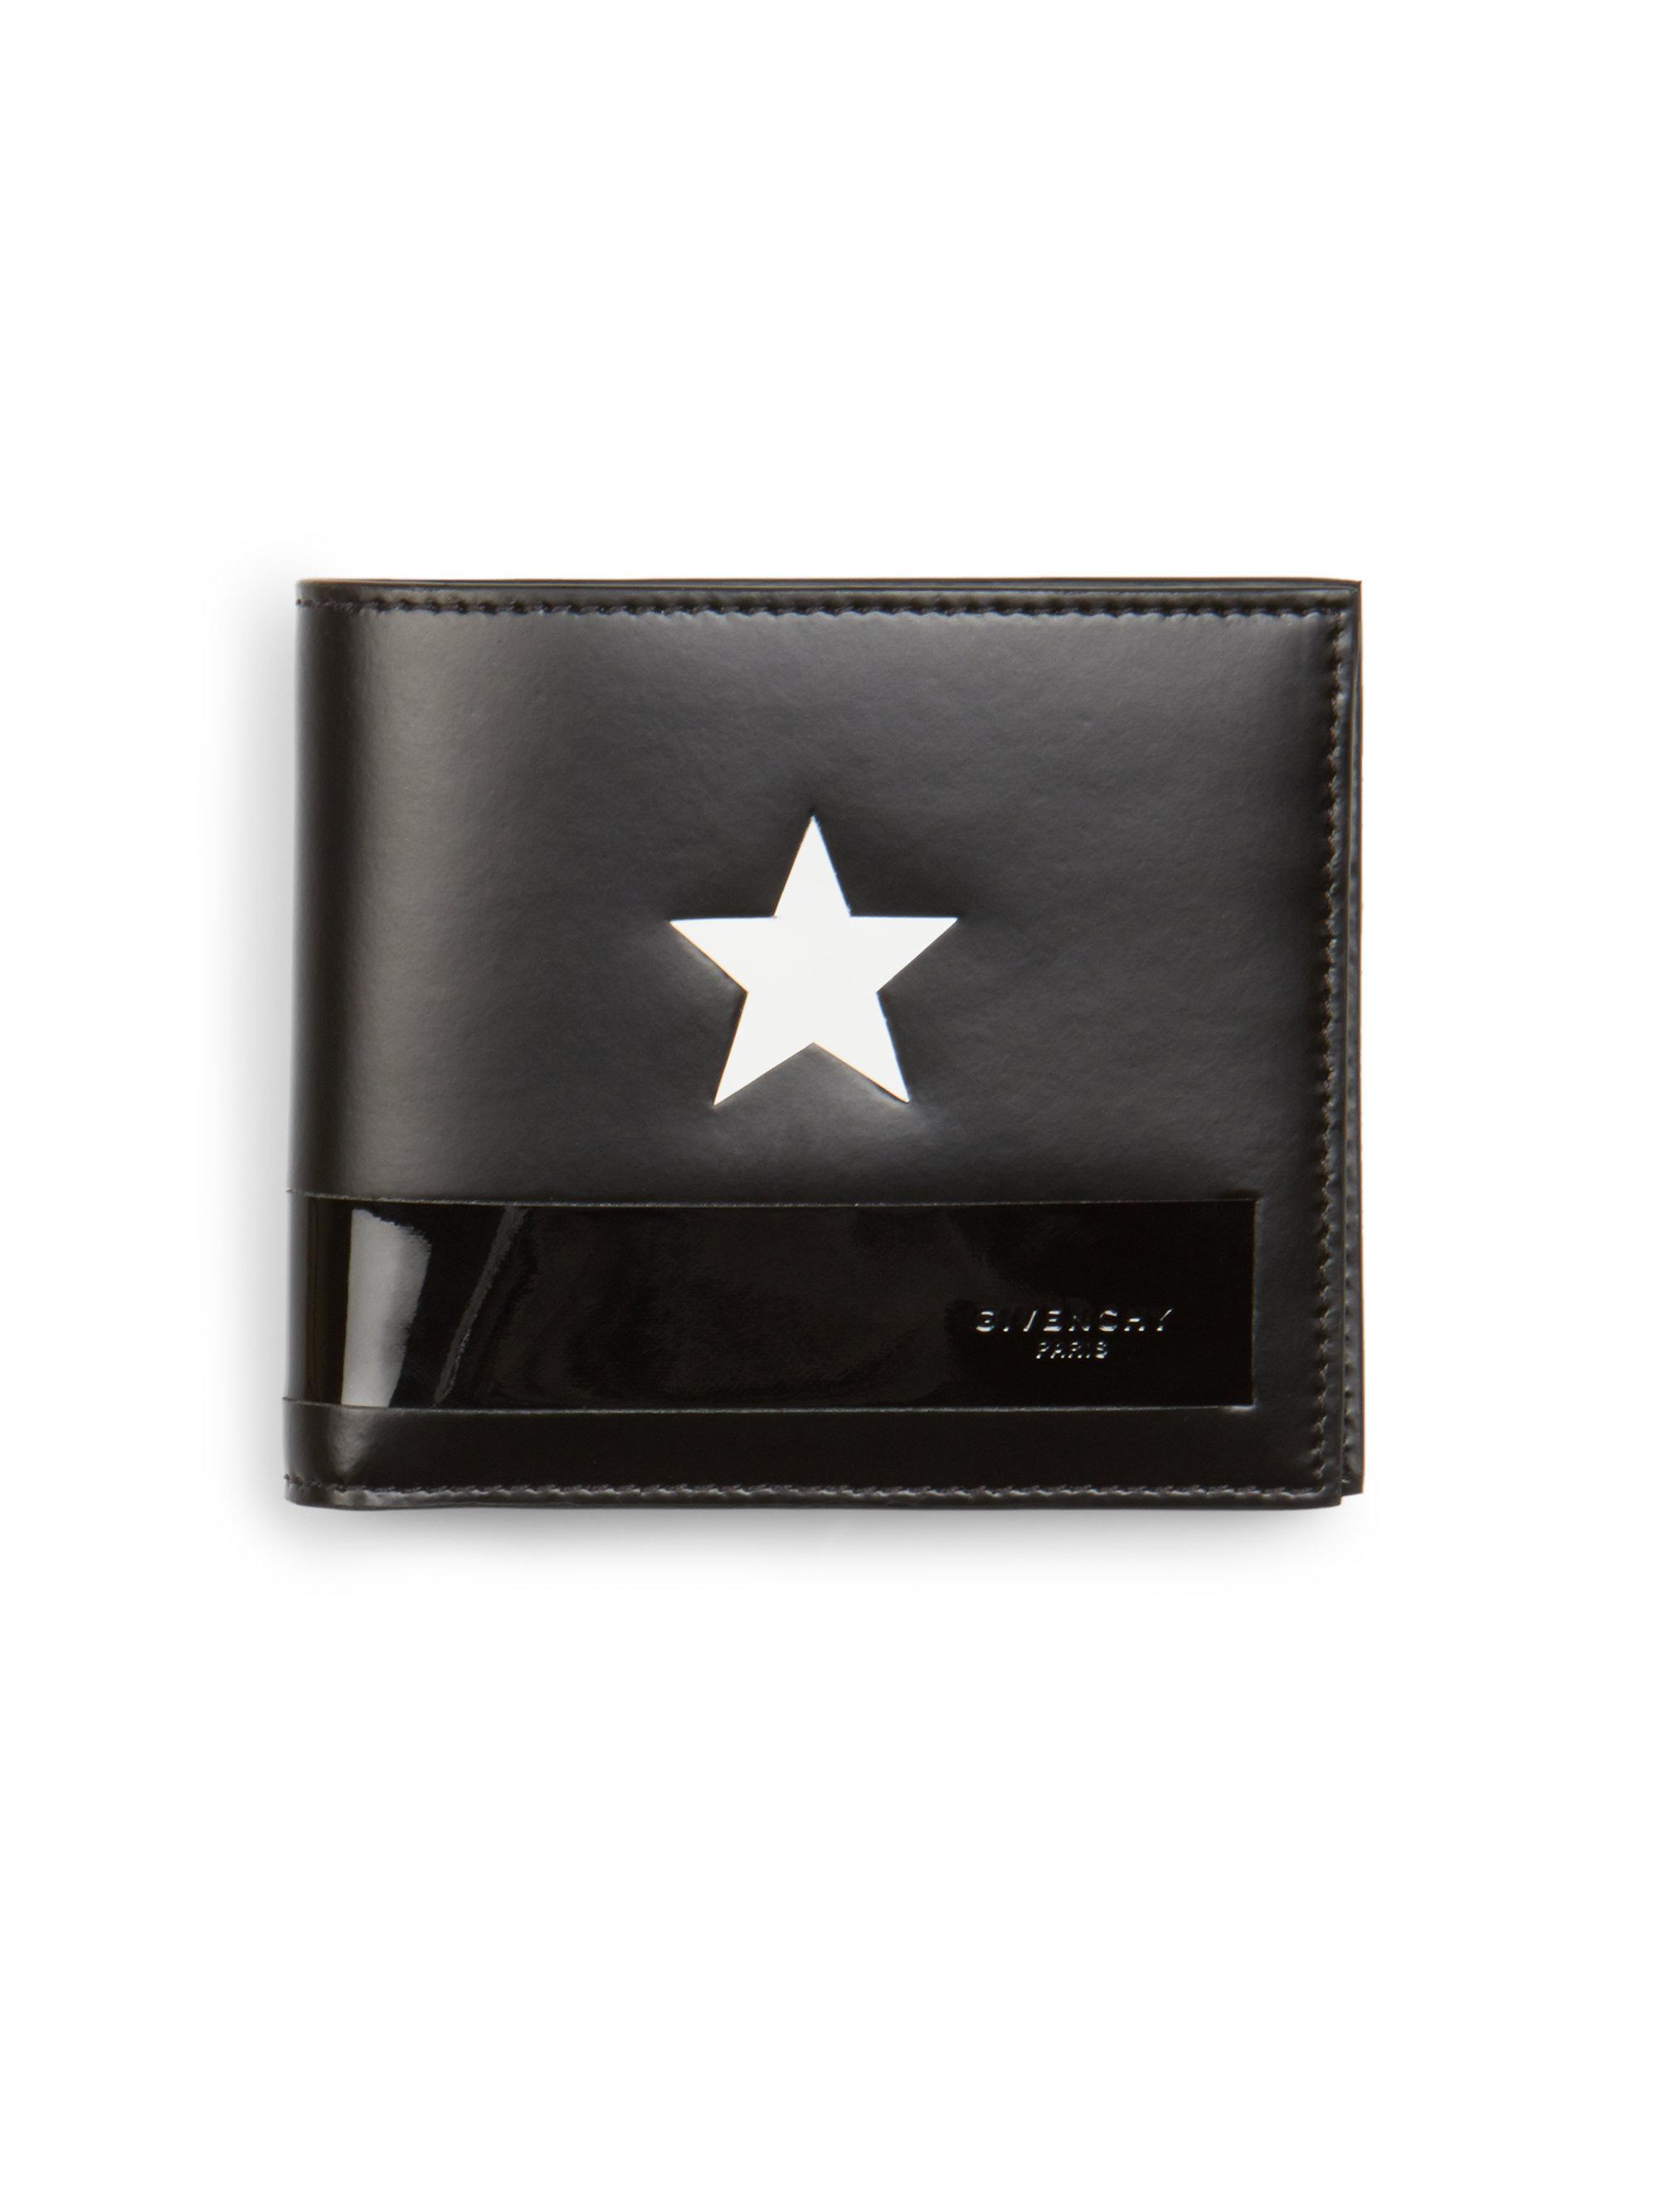 6728e740f2 Givenchy Star & Stripe Billfold Wallet in Black for Men - Lyst